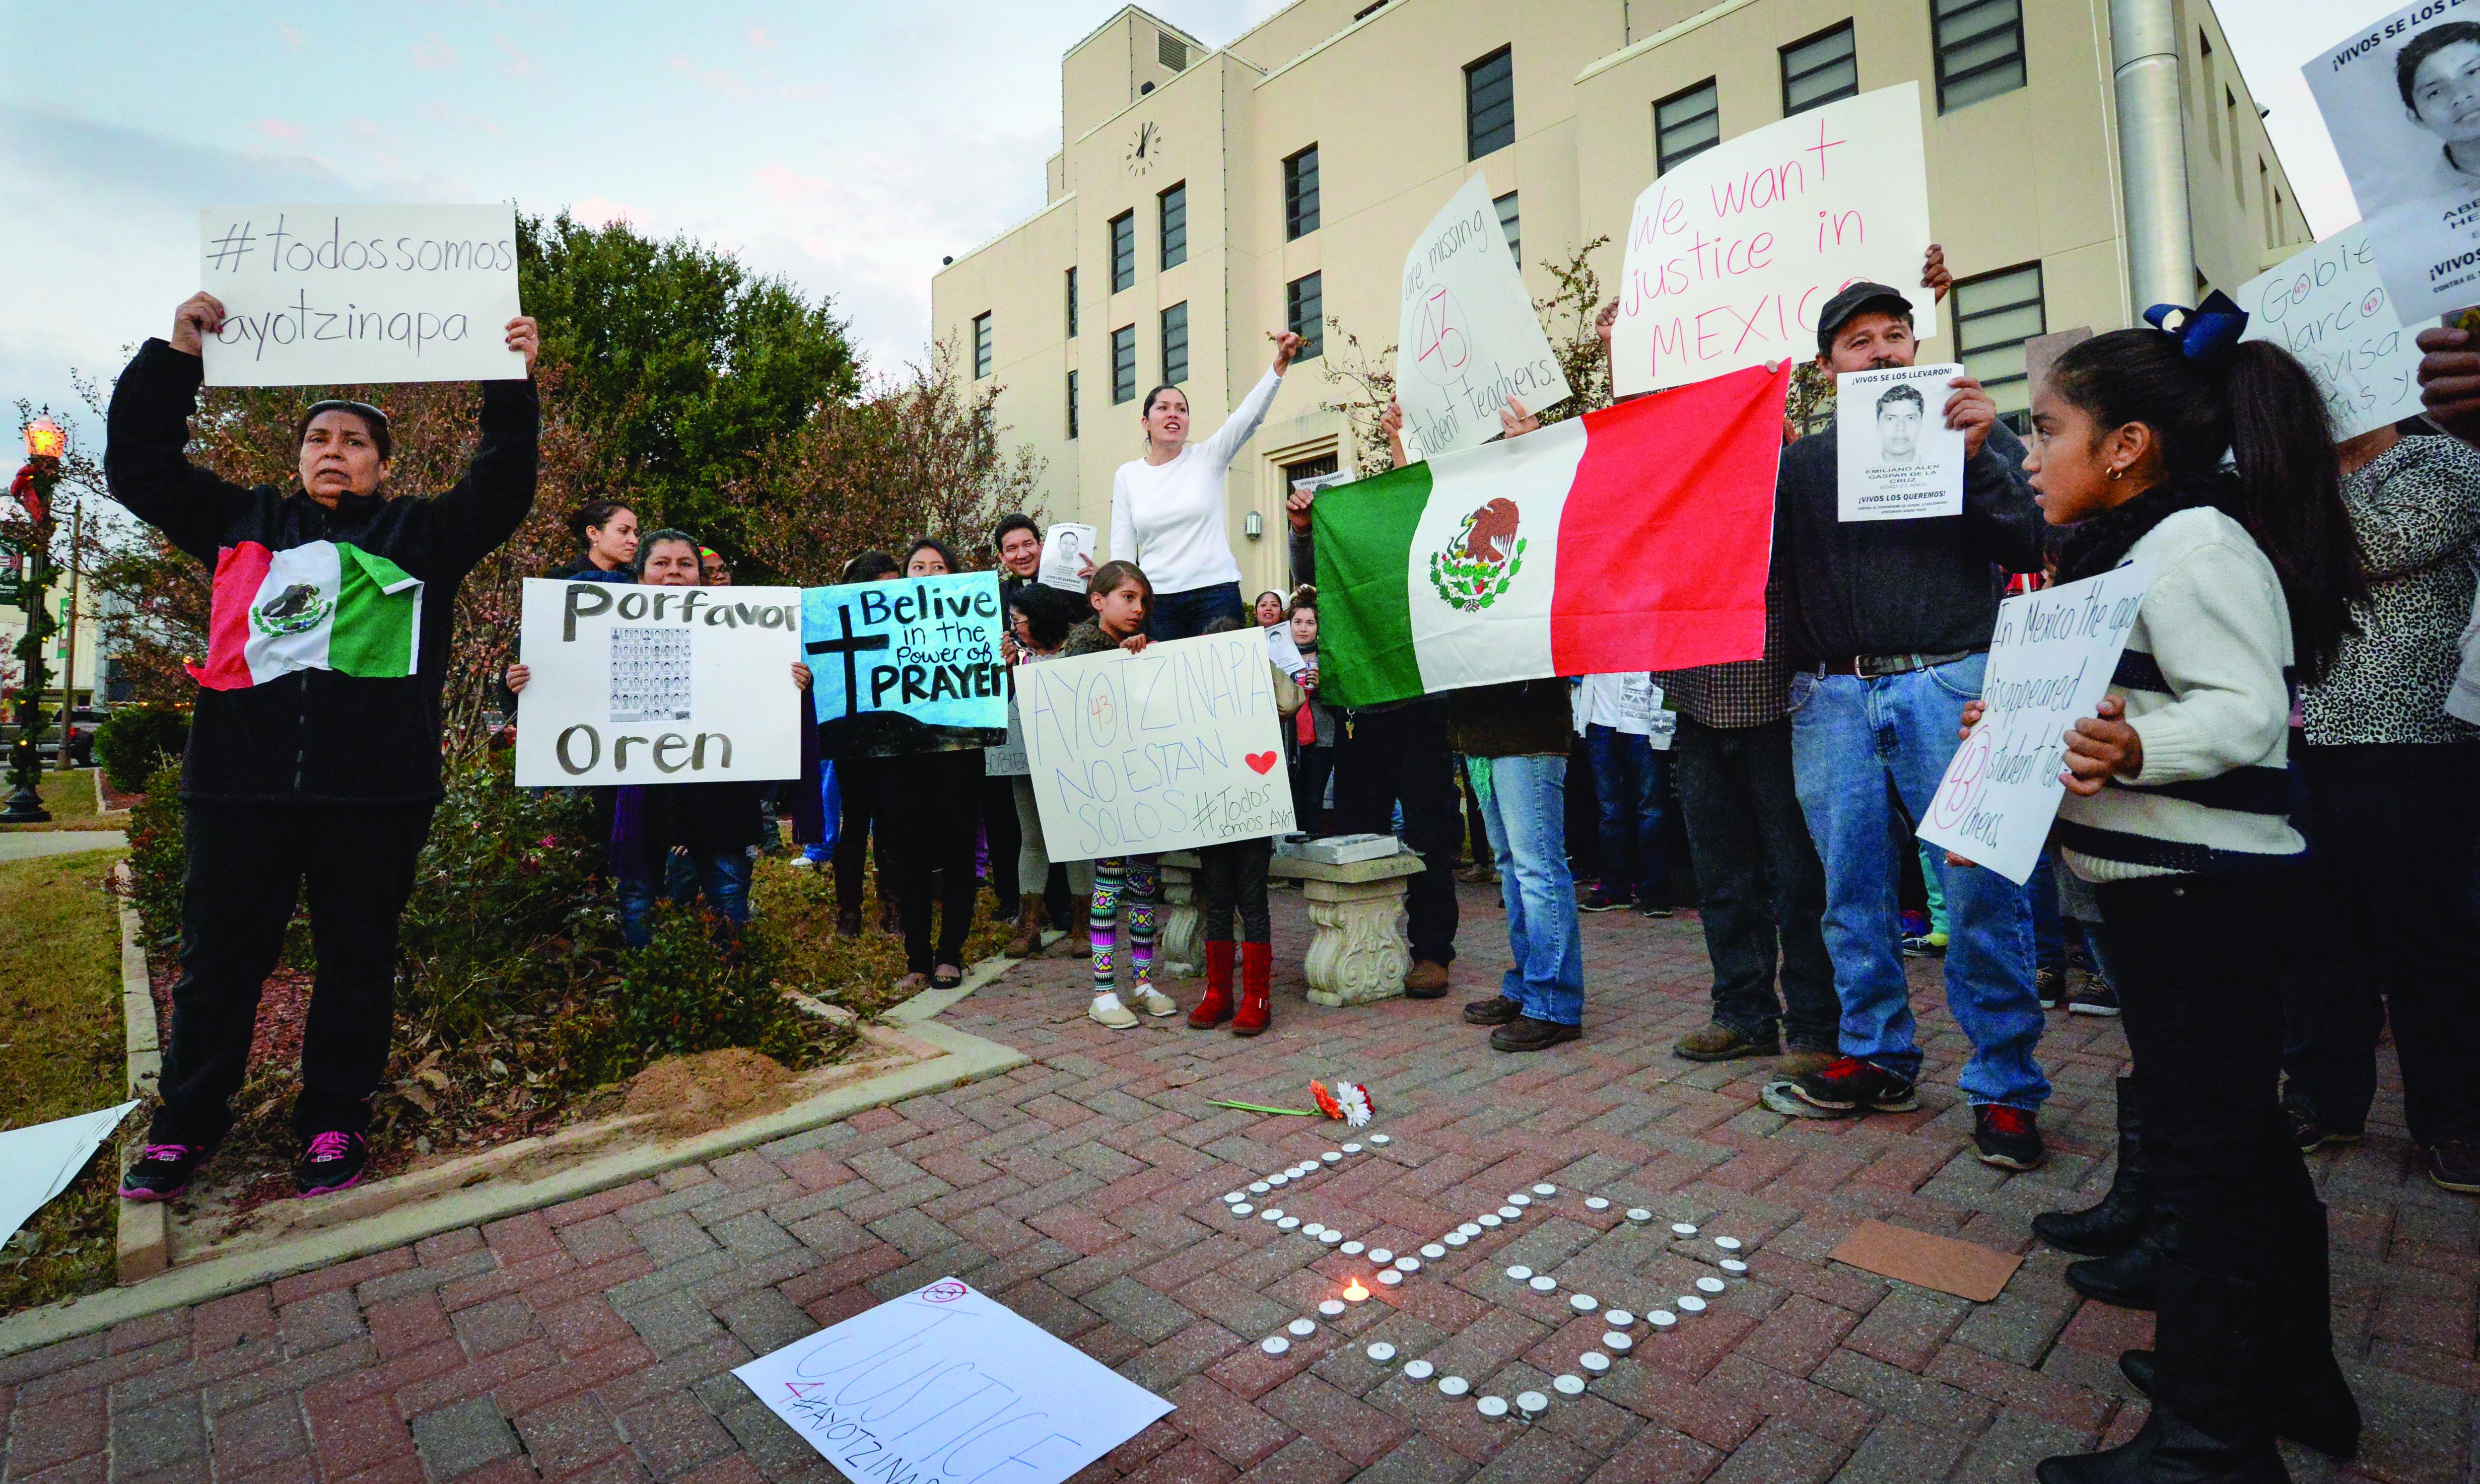 Ayotzinapa student rally, Mount Pleasant, December 2014